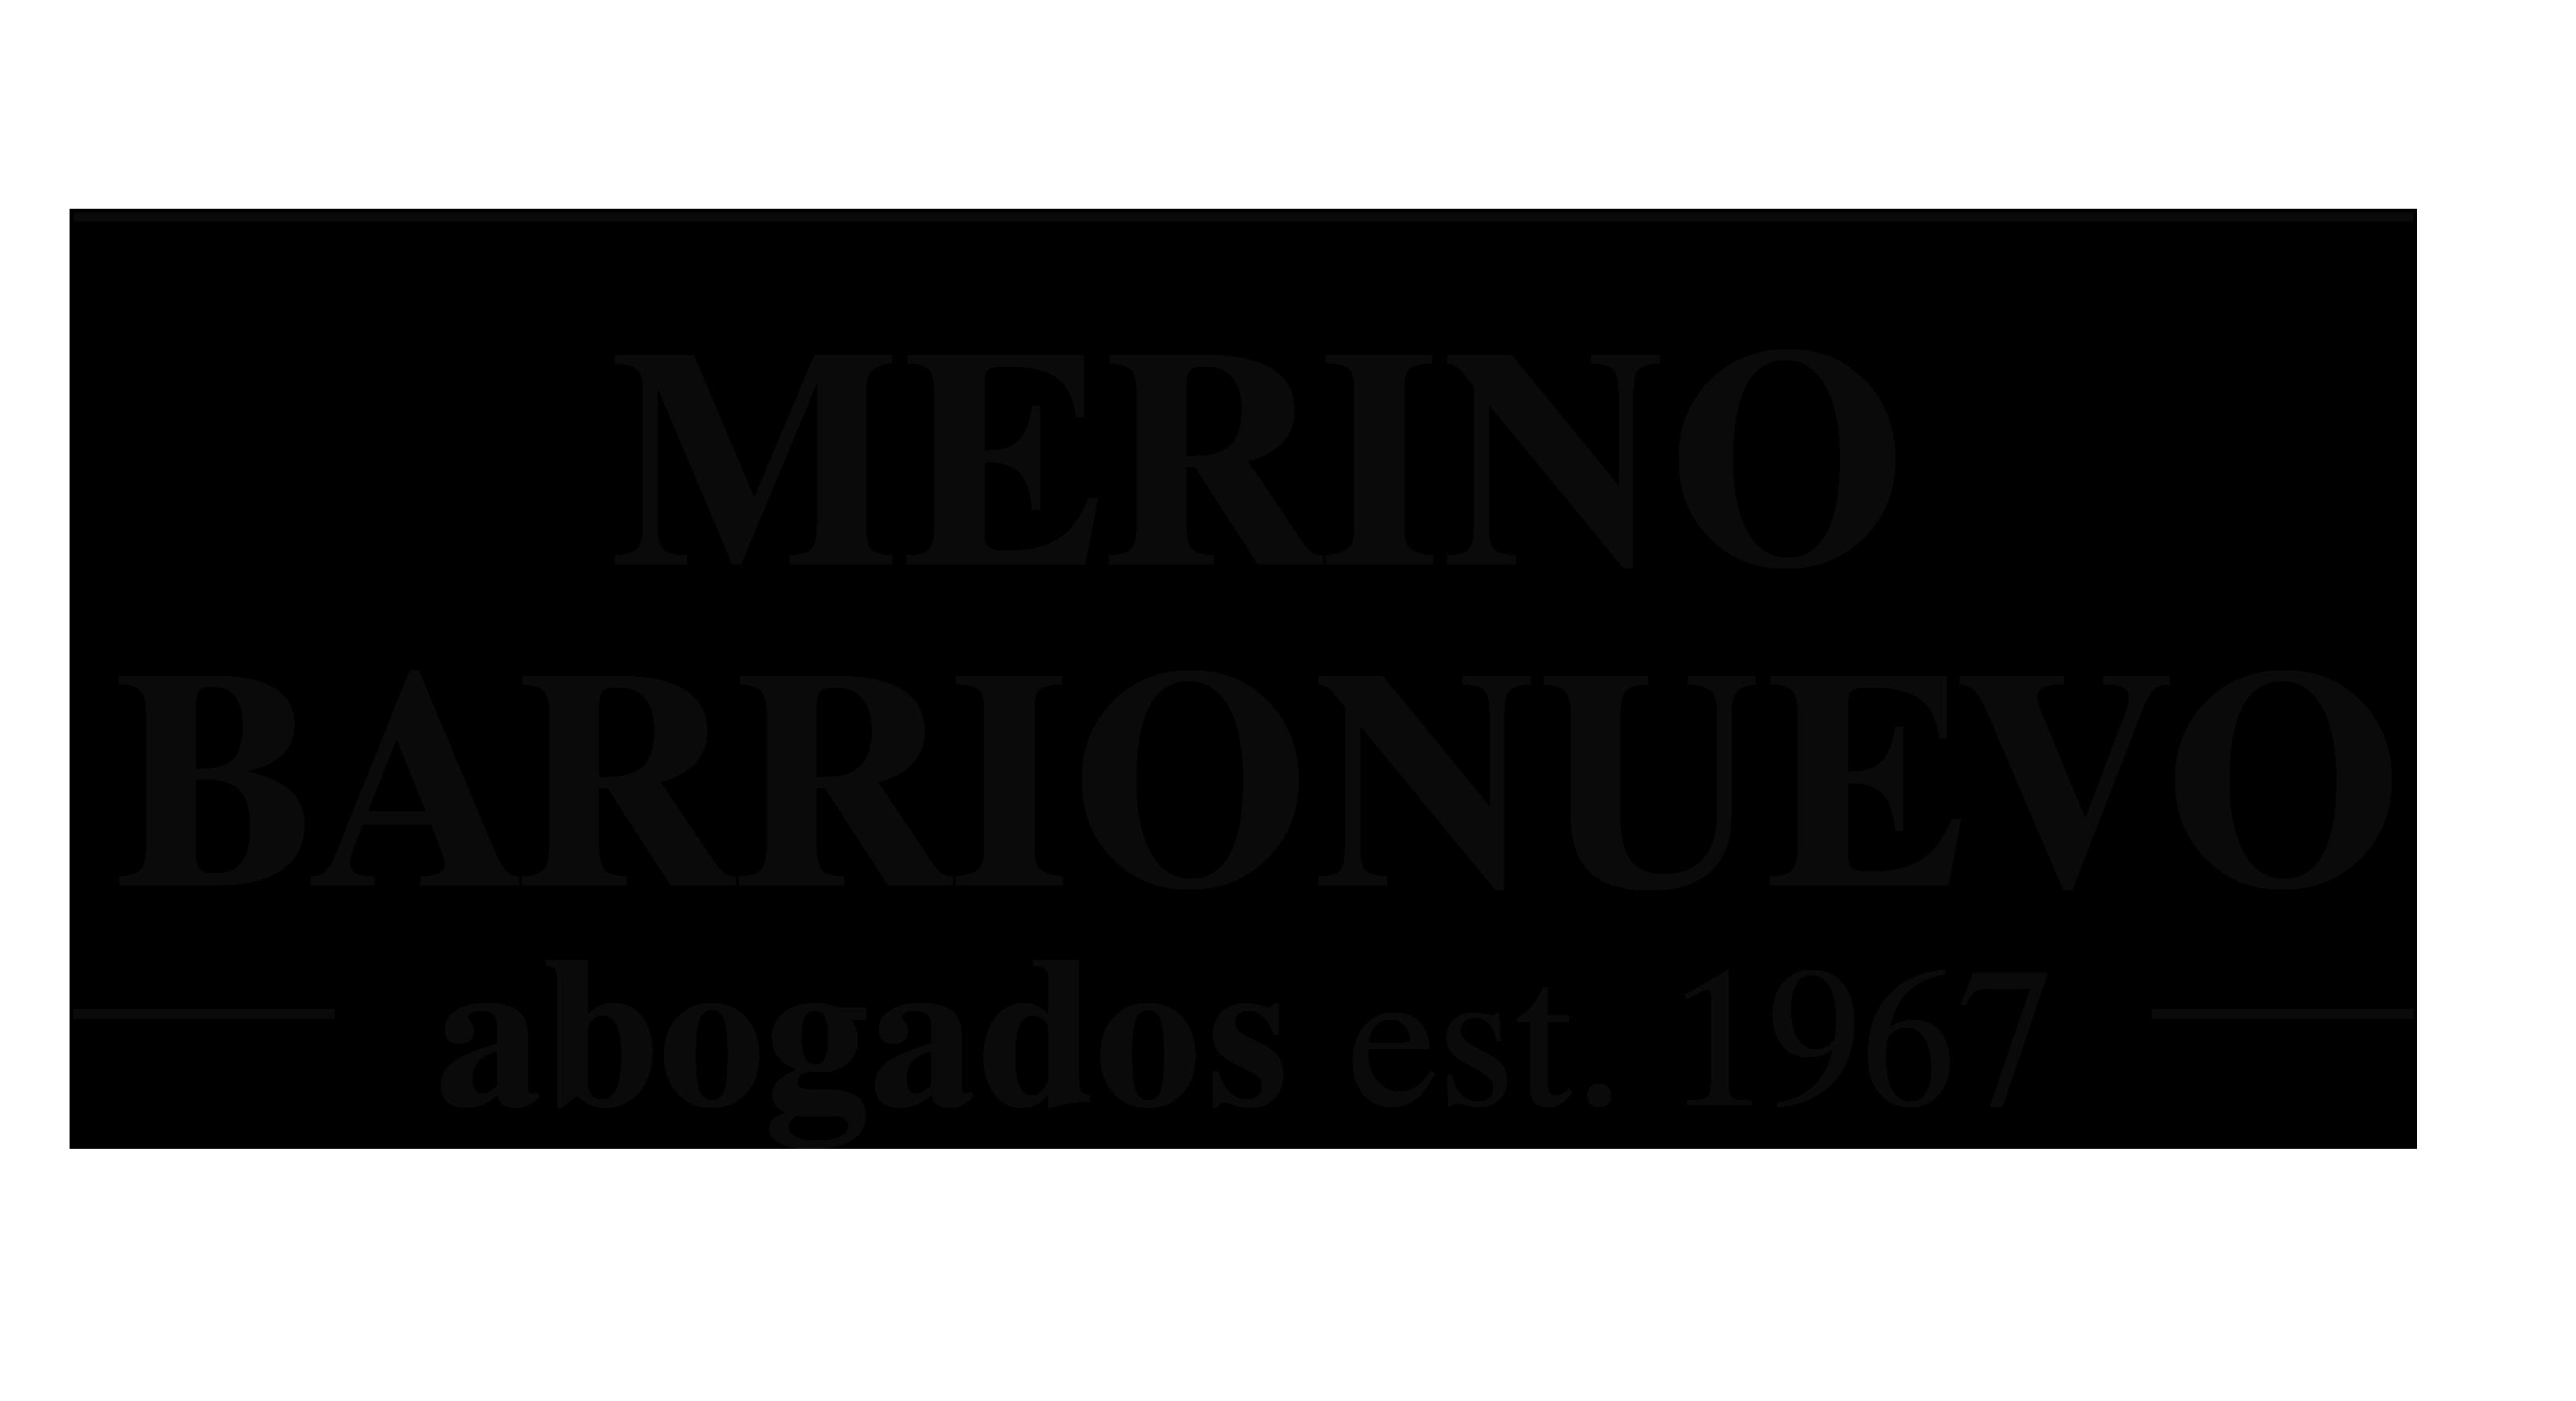 MERINO BARRIONUEVO - Abogados